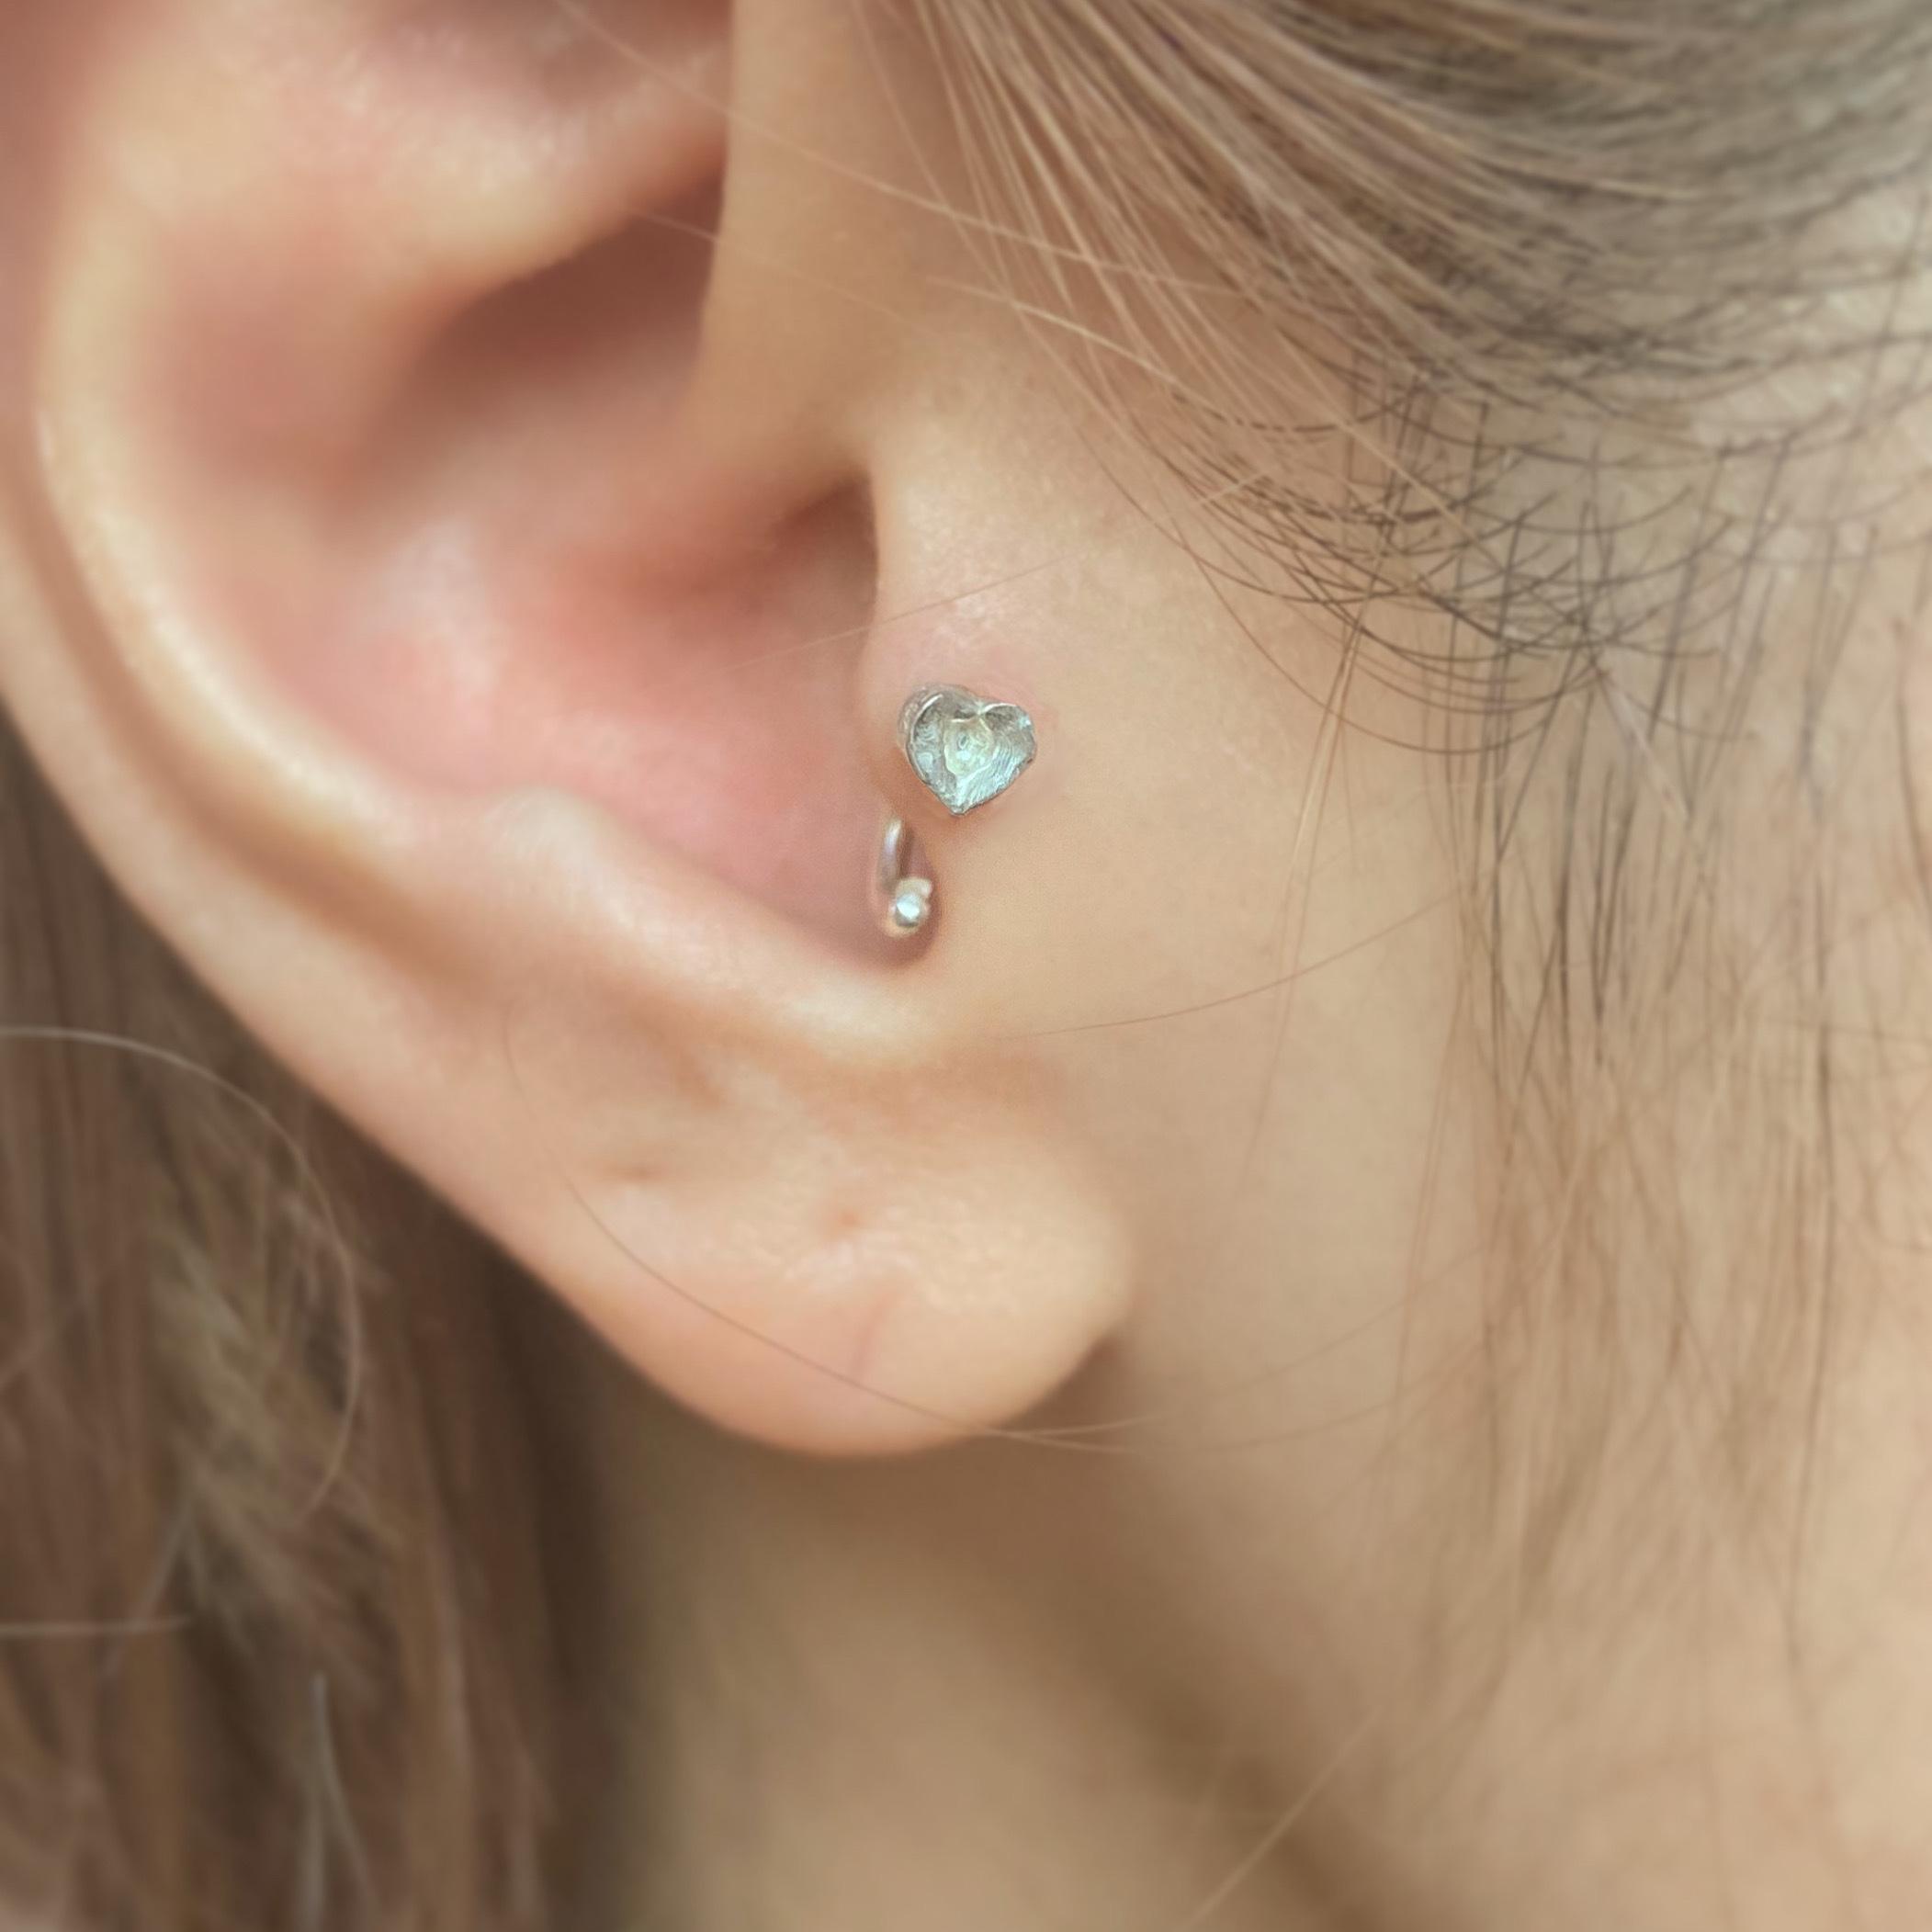 桃のbody earring silver925  14G #LJ20030P  16G #LJ20029P  18G #LJ20028P